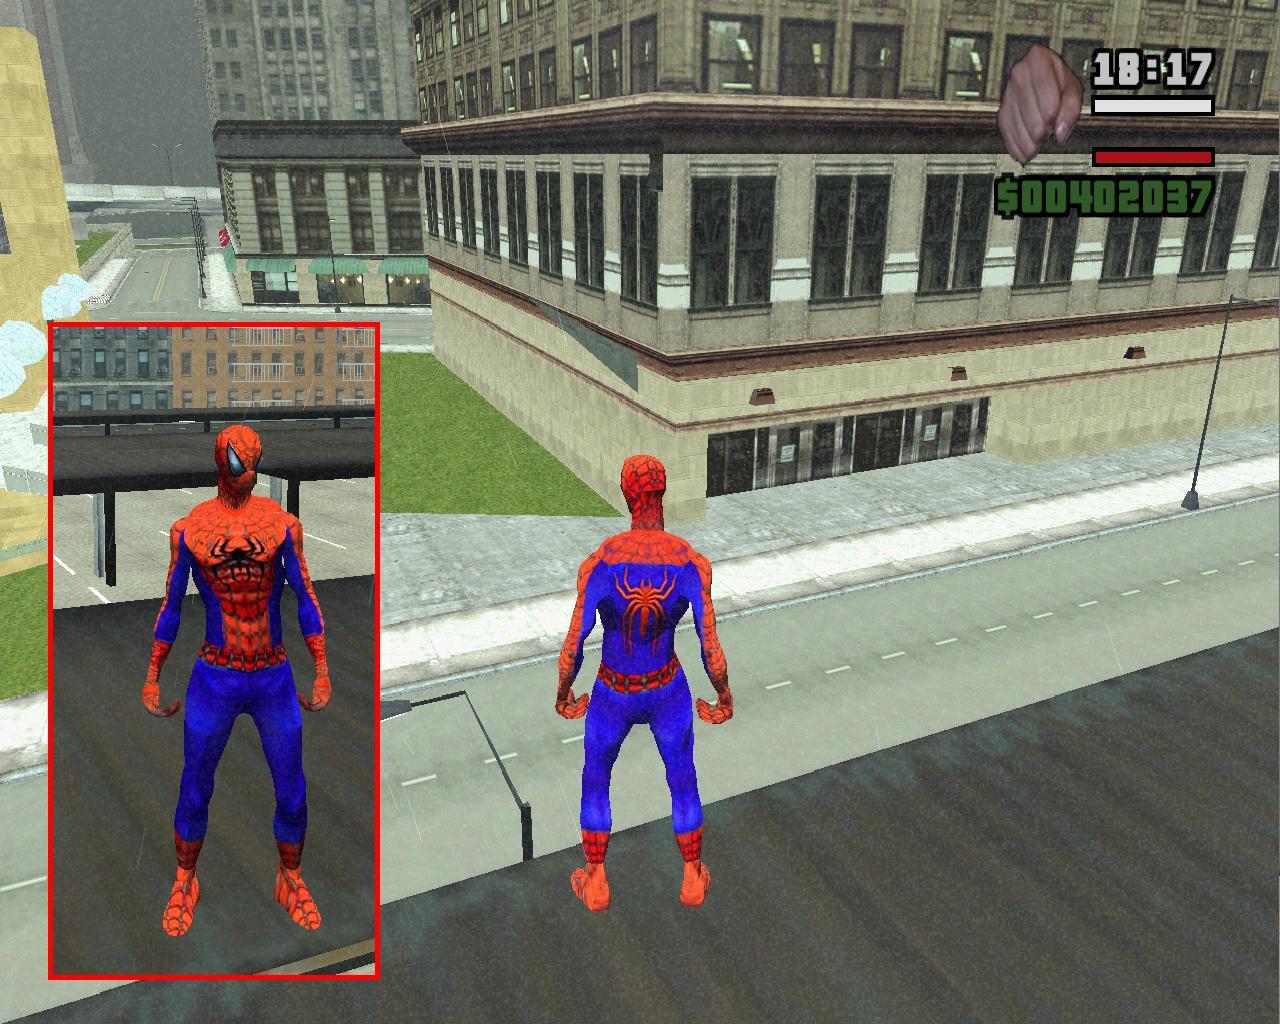 gta san andreas spiderman mod download pc free